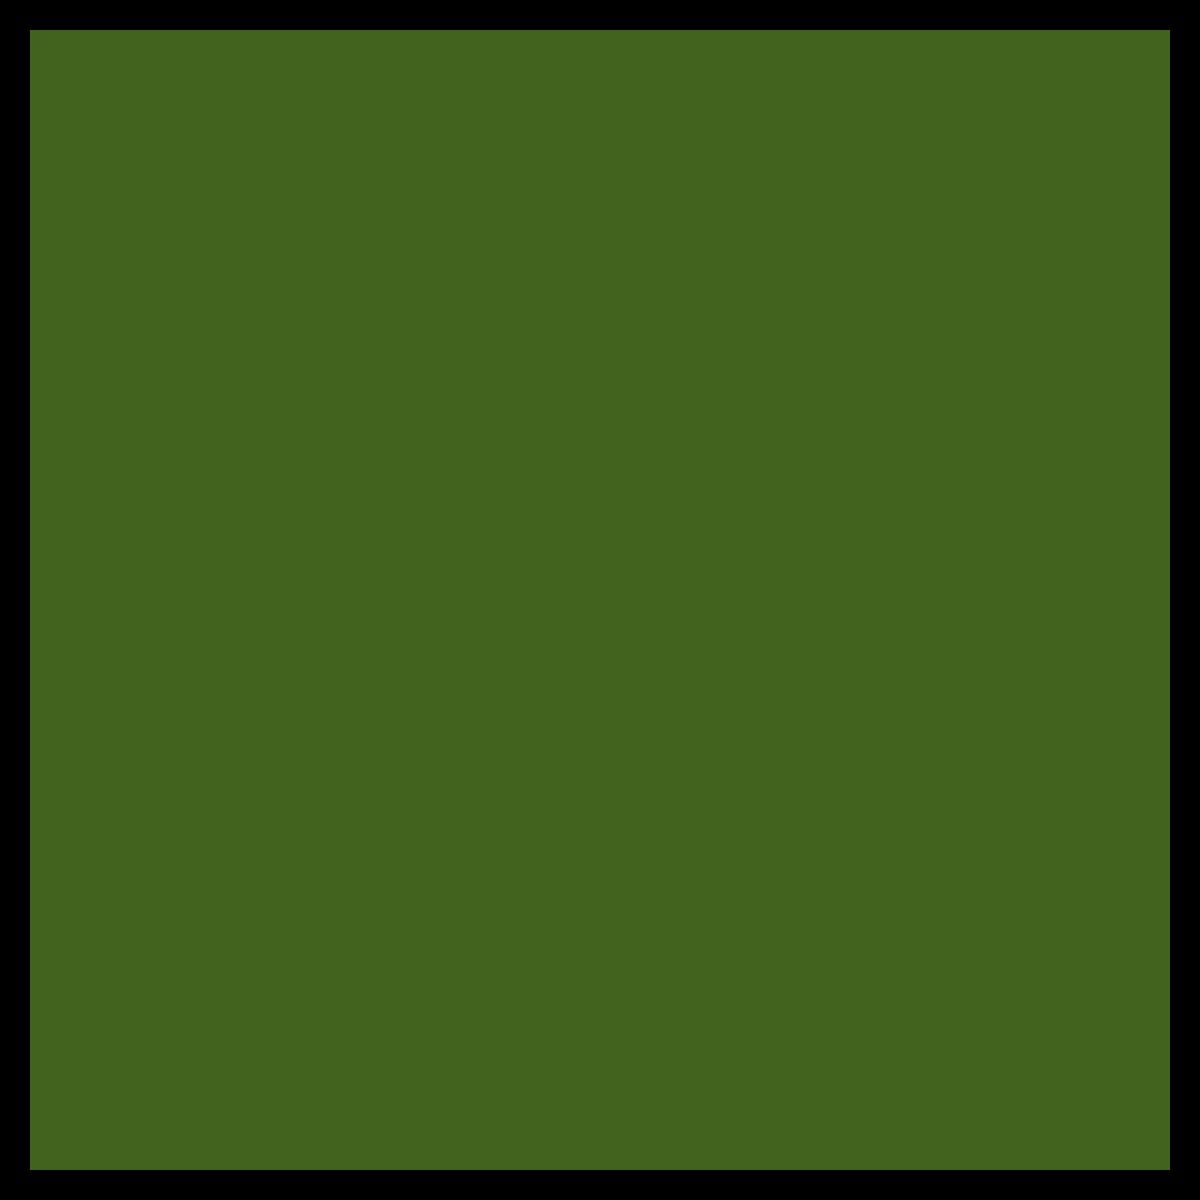 prevention education icon